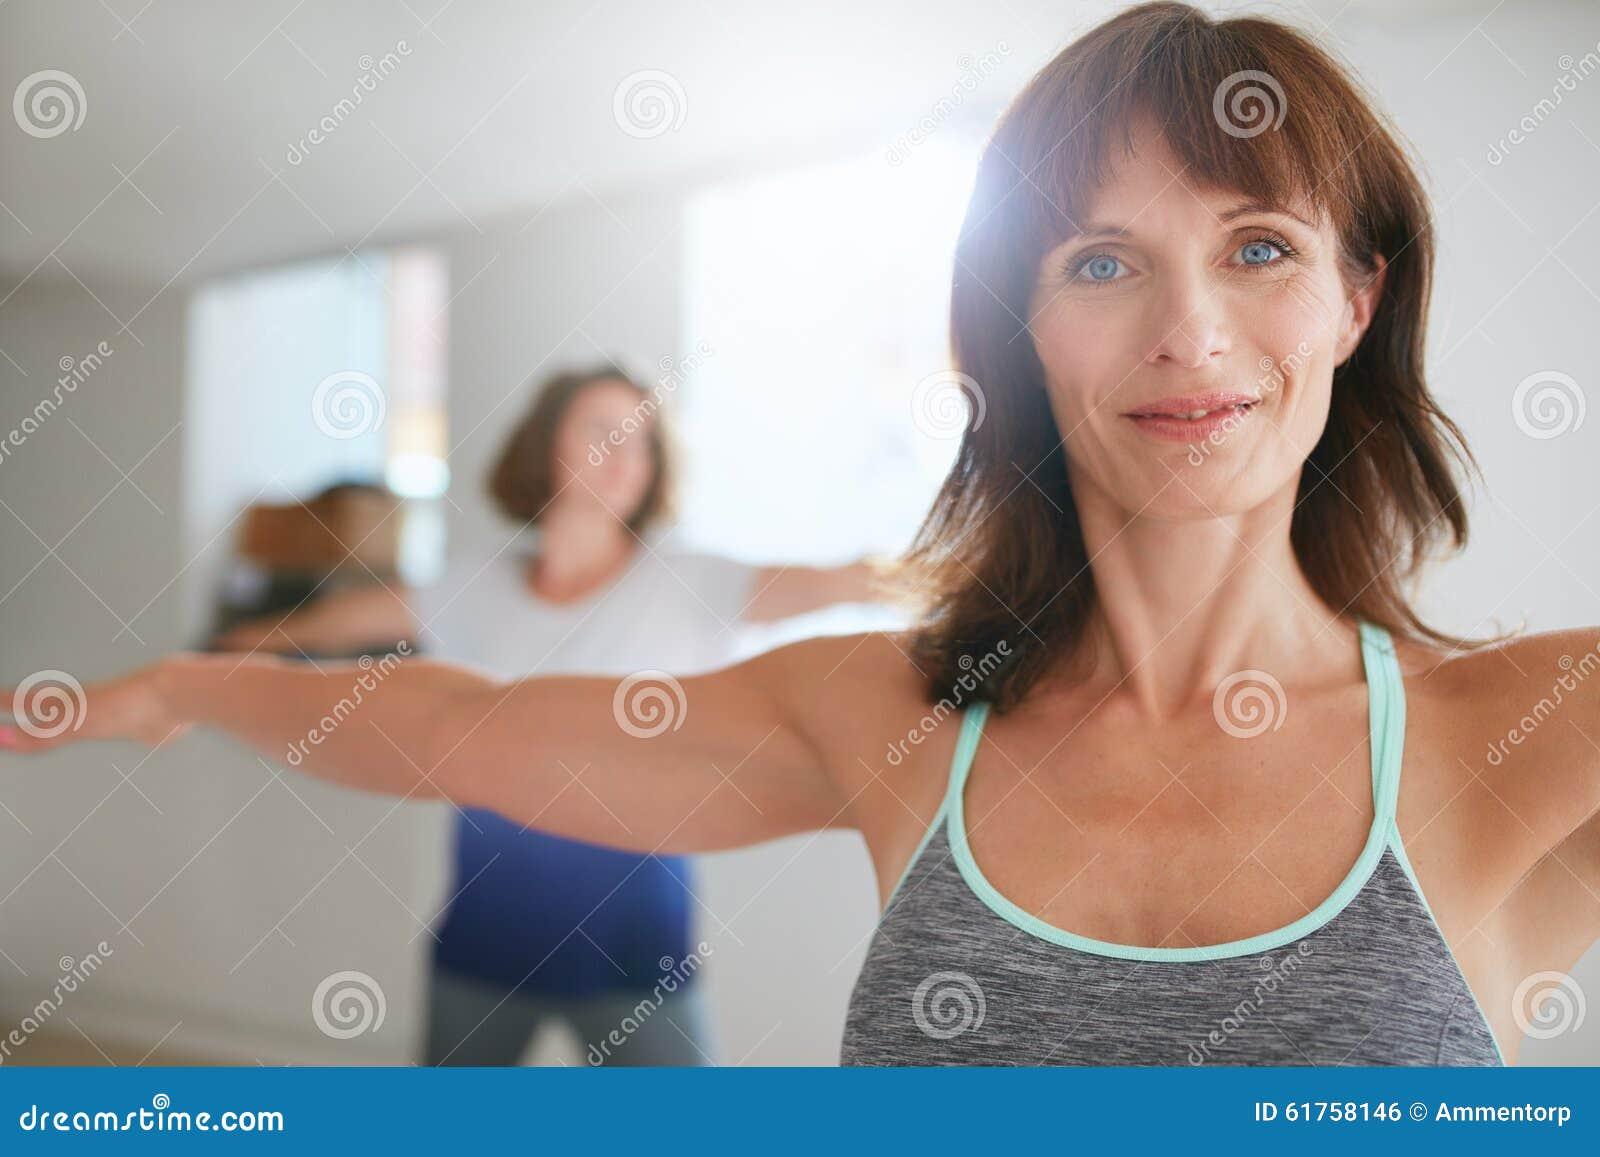 Free mature women posing pics